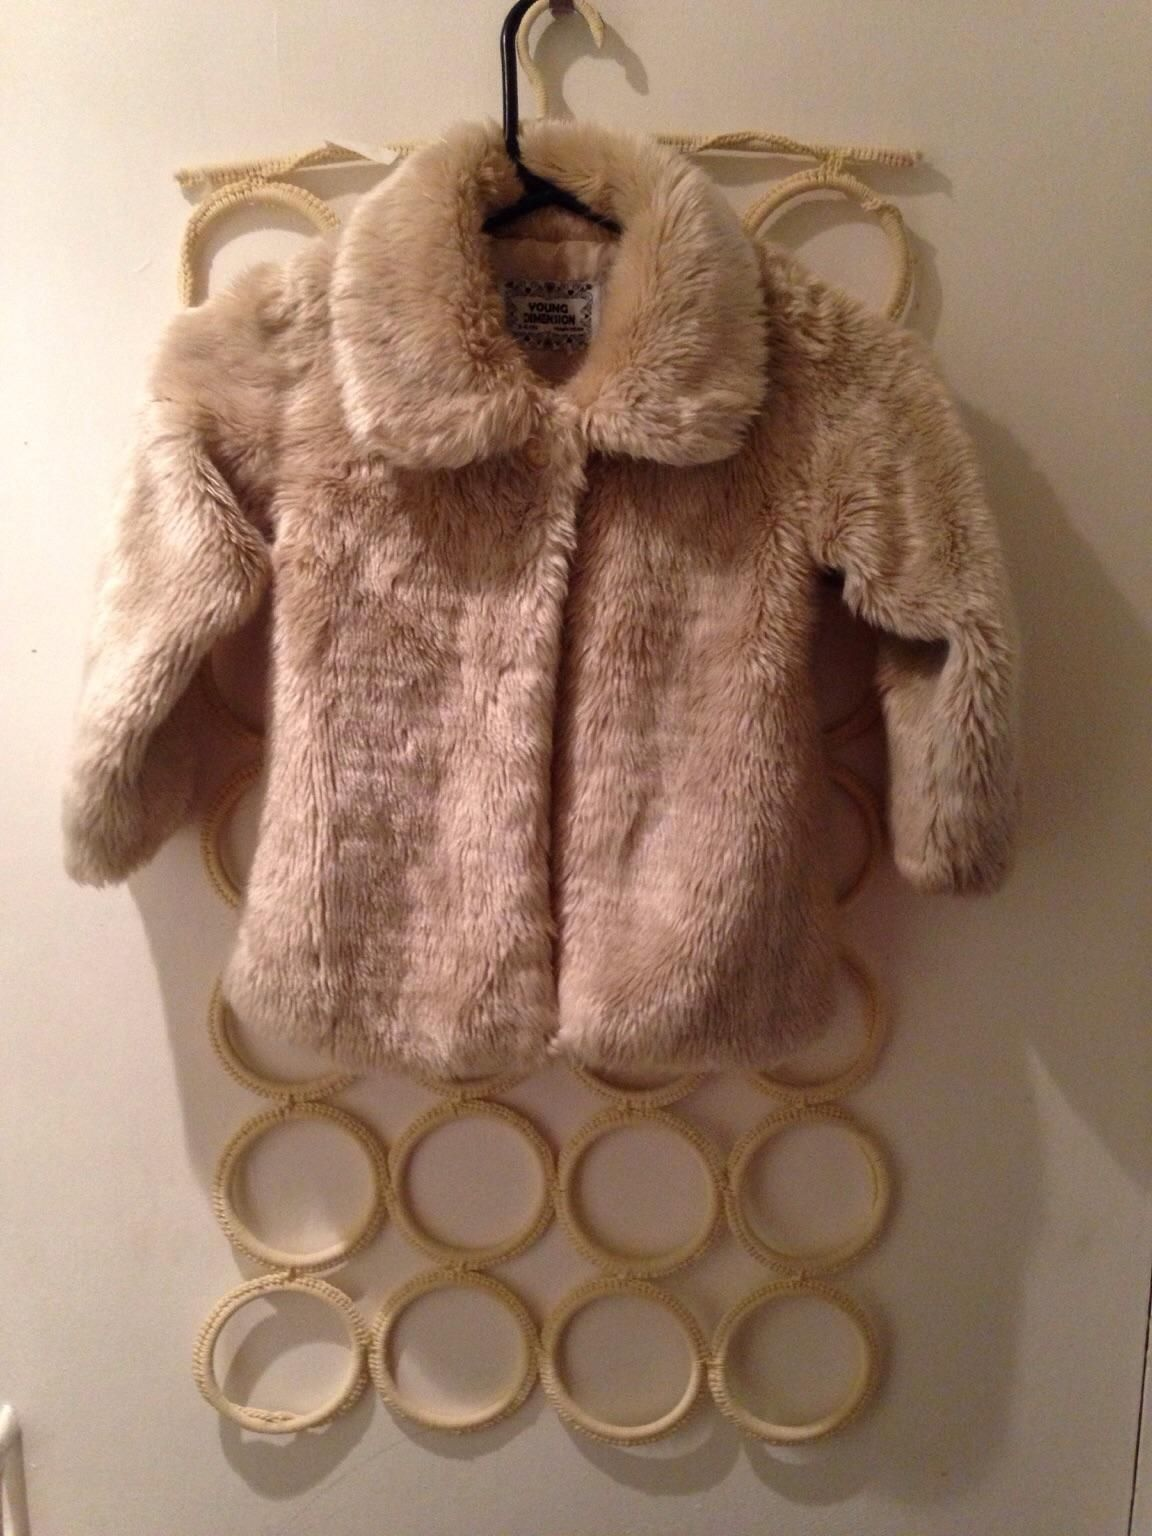 Gebraucht Childs faux coat 5-6yrs in BR3 Beckenham um £ 6,00 – Shpock